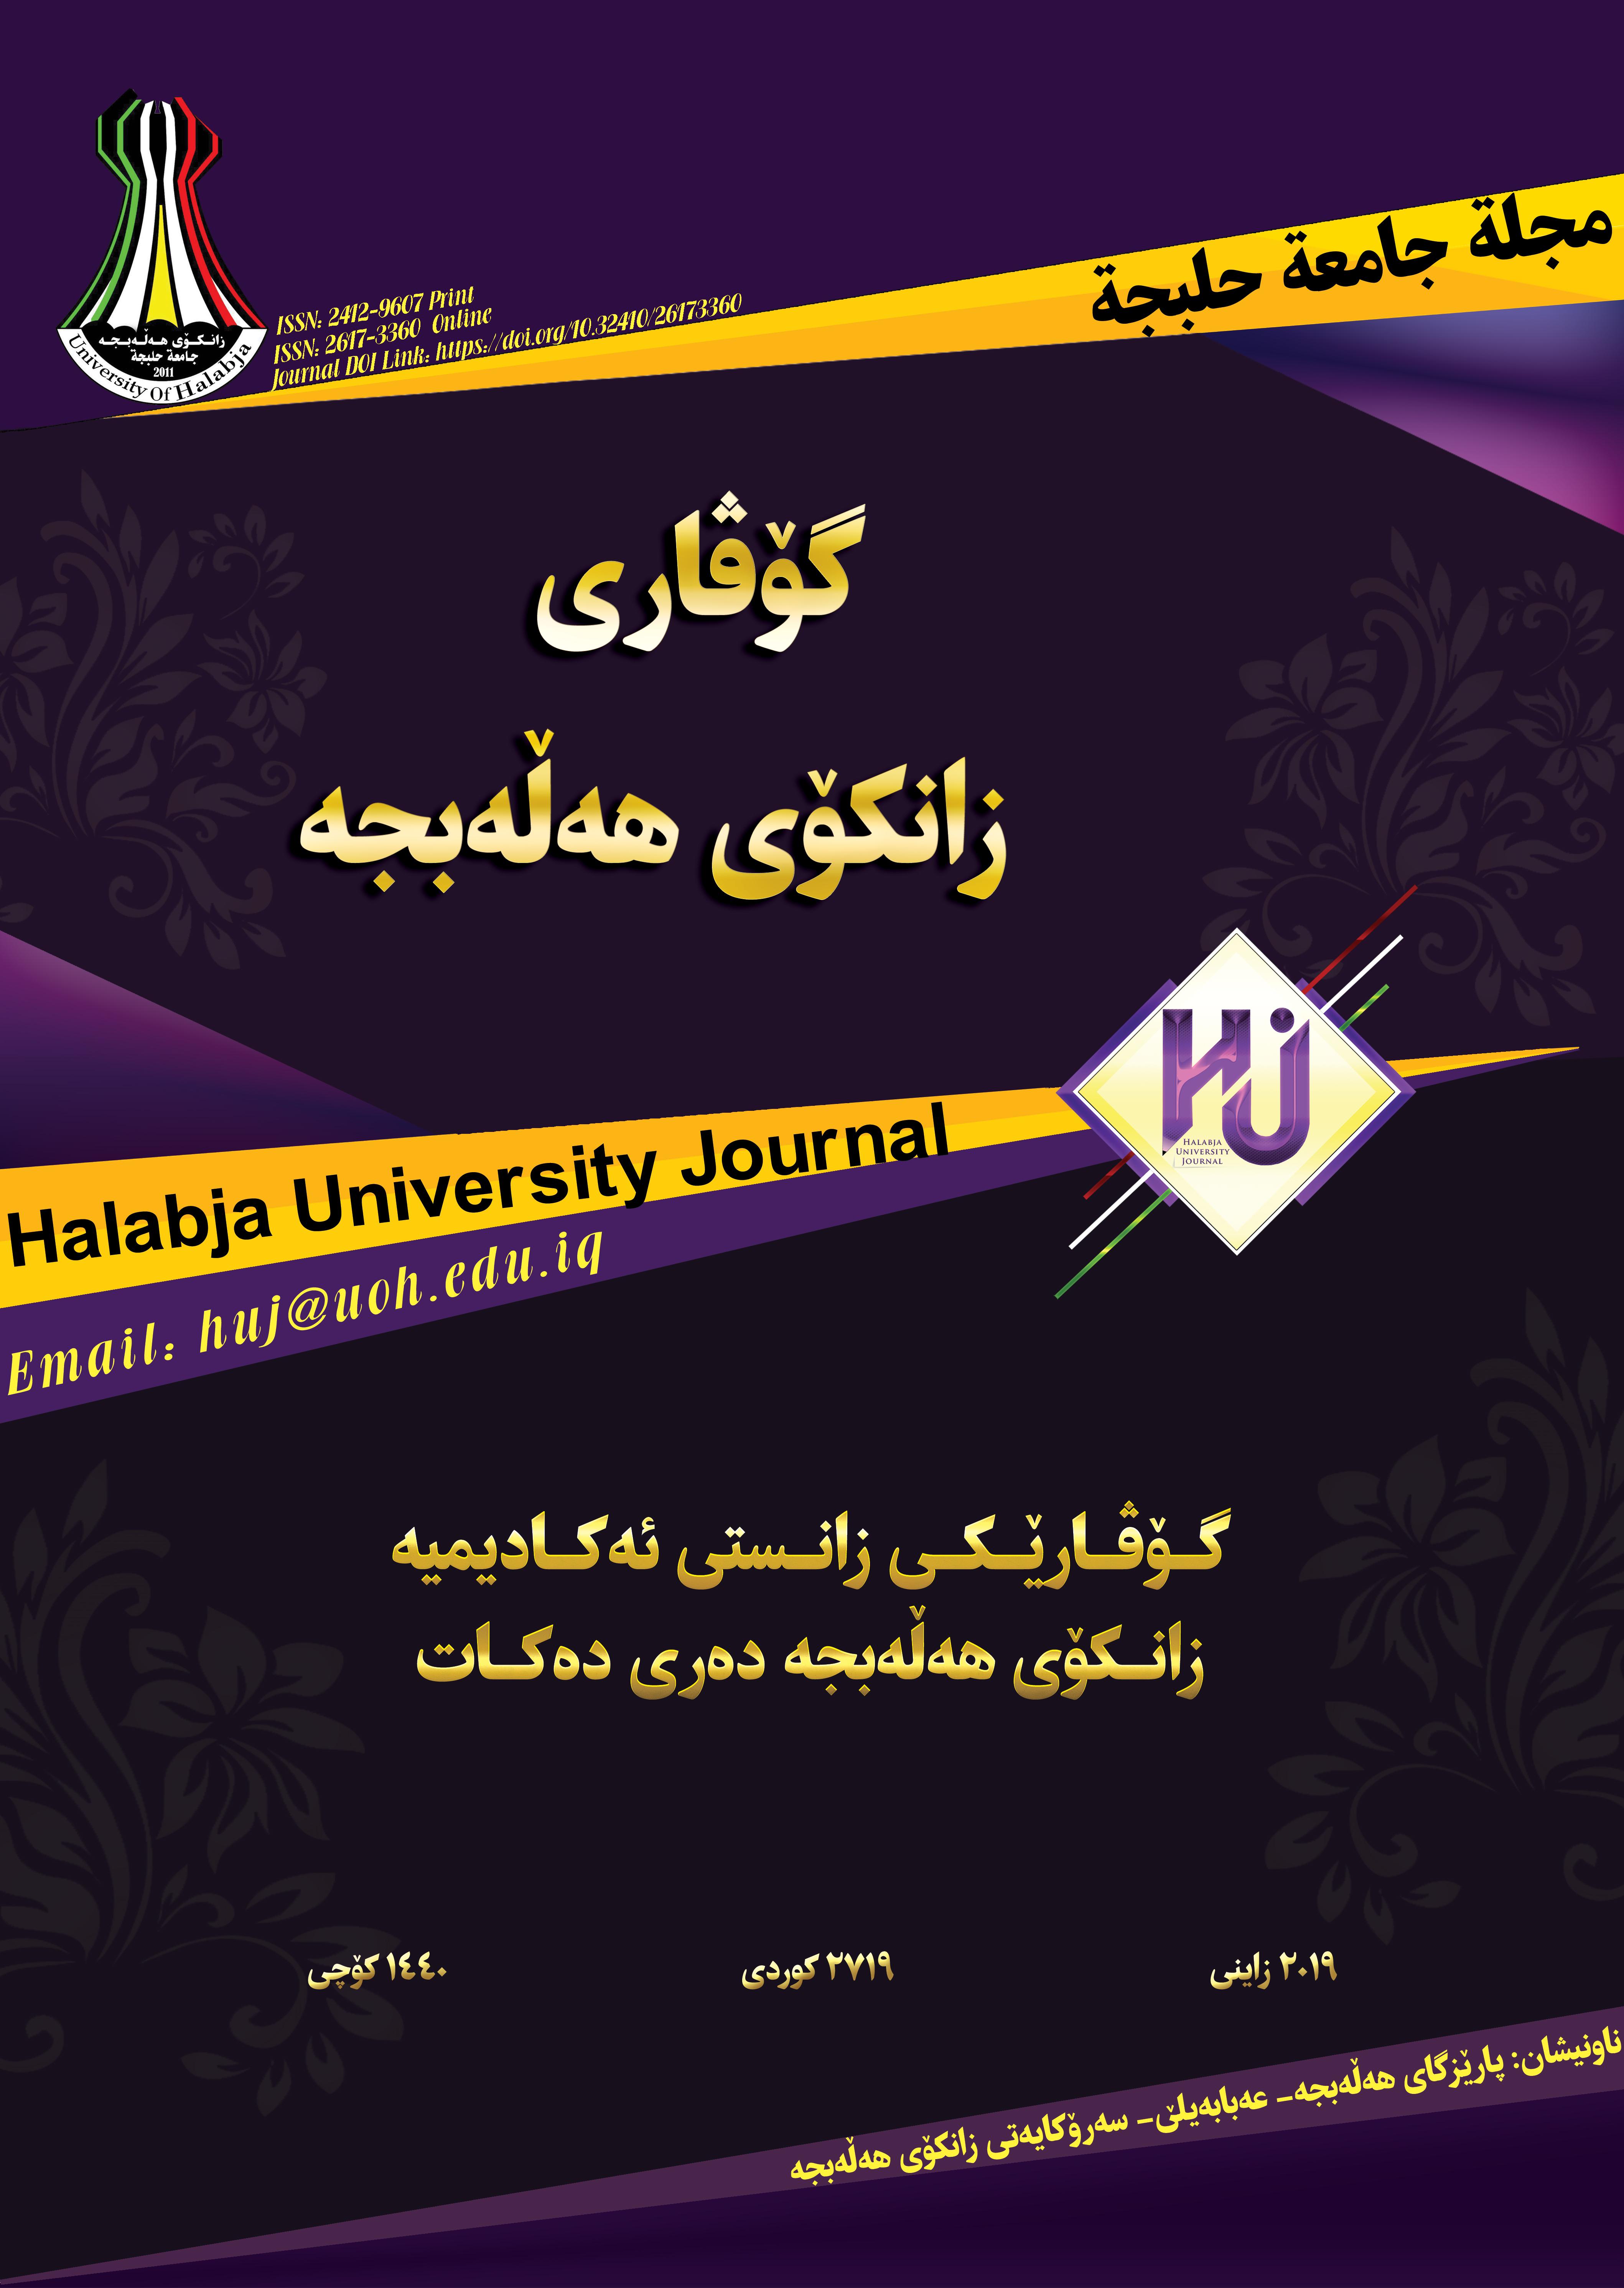 Halabja University Journal